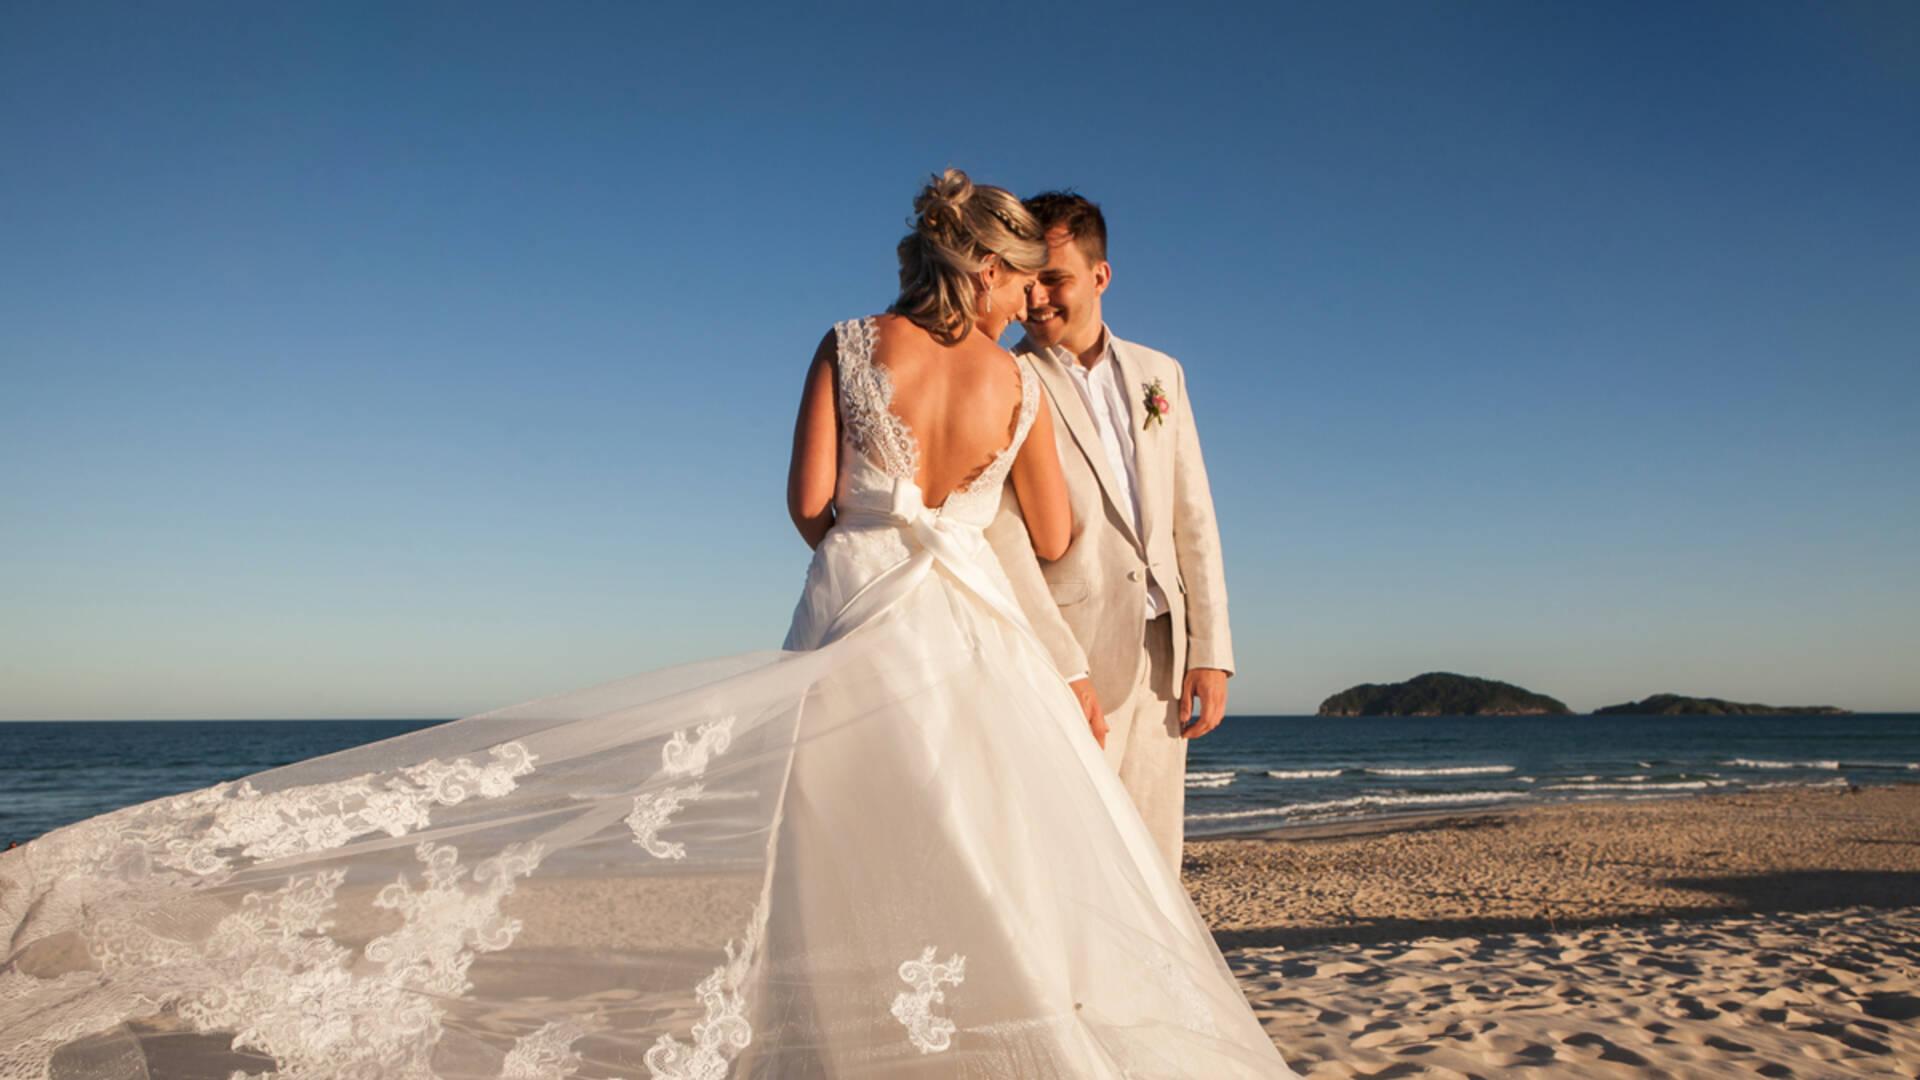 Casamento de Janine e Kaleb